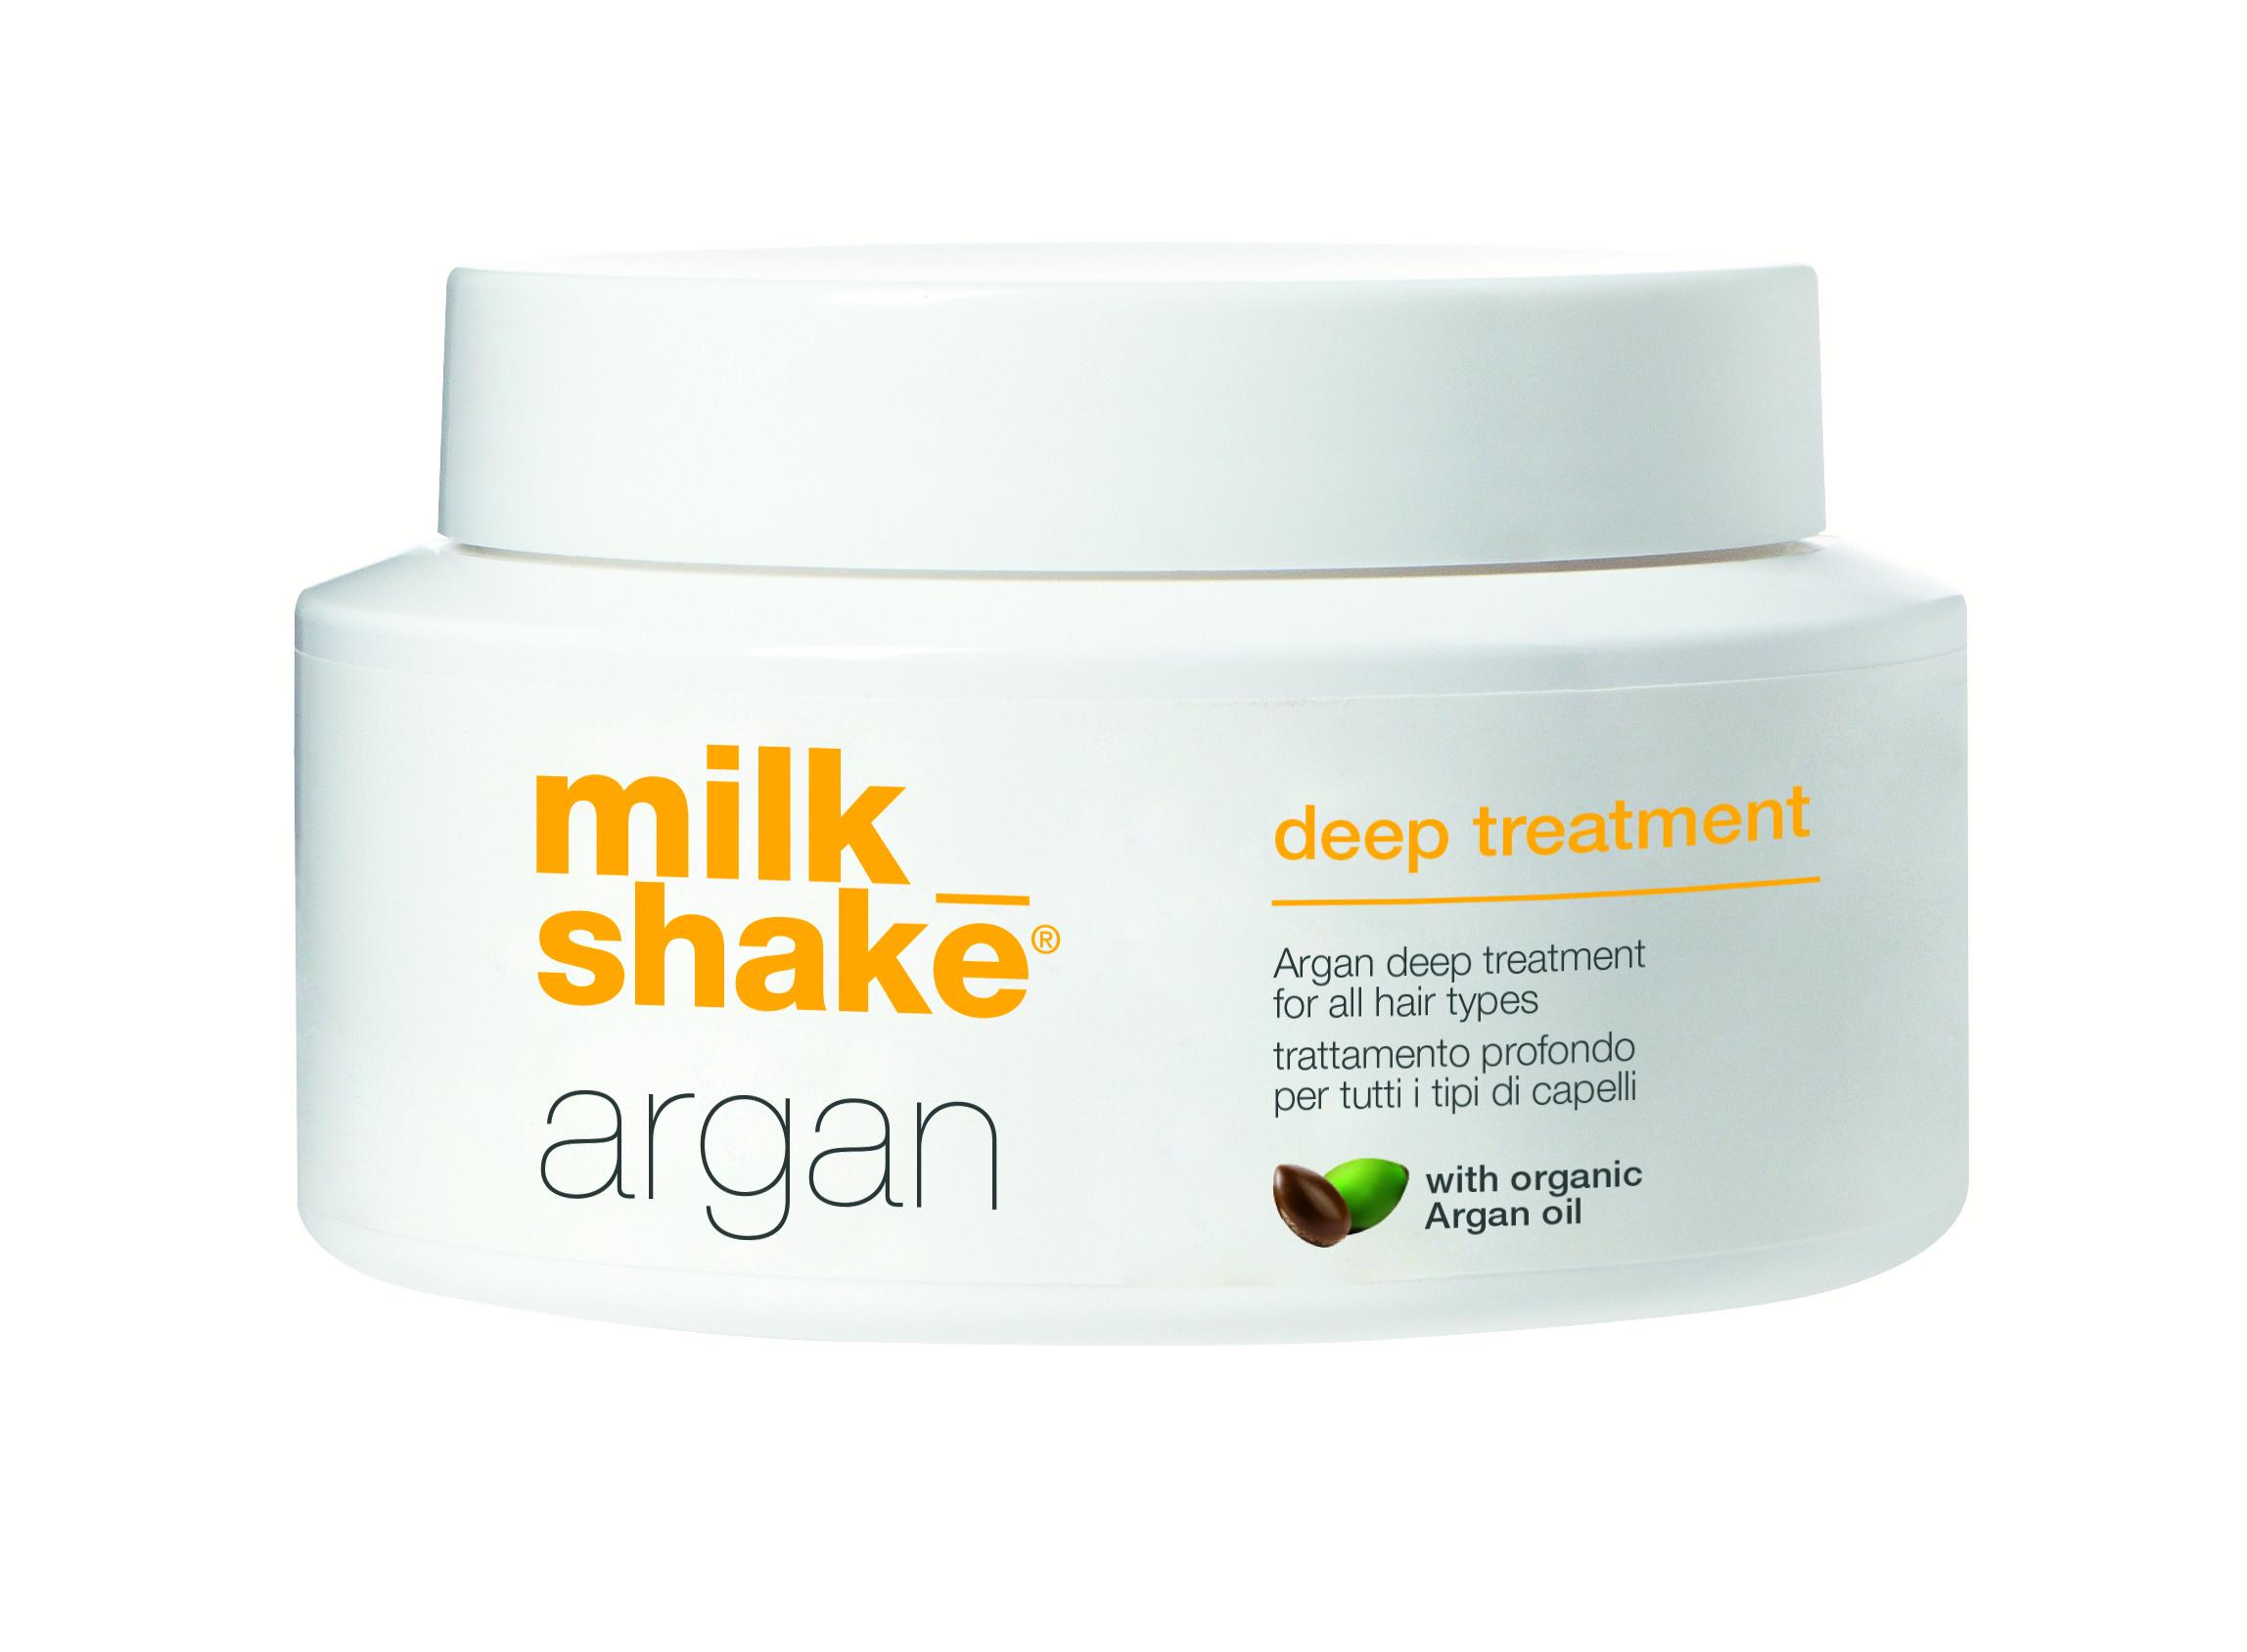 milk_shake - Argan Oil Deep Treatment 200 ml